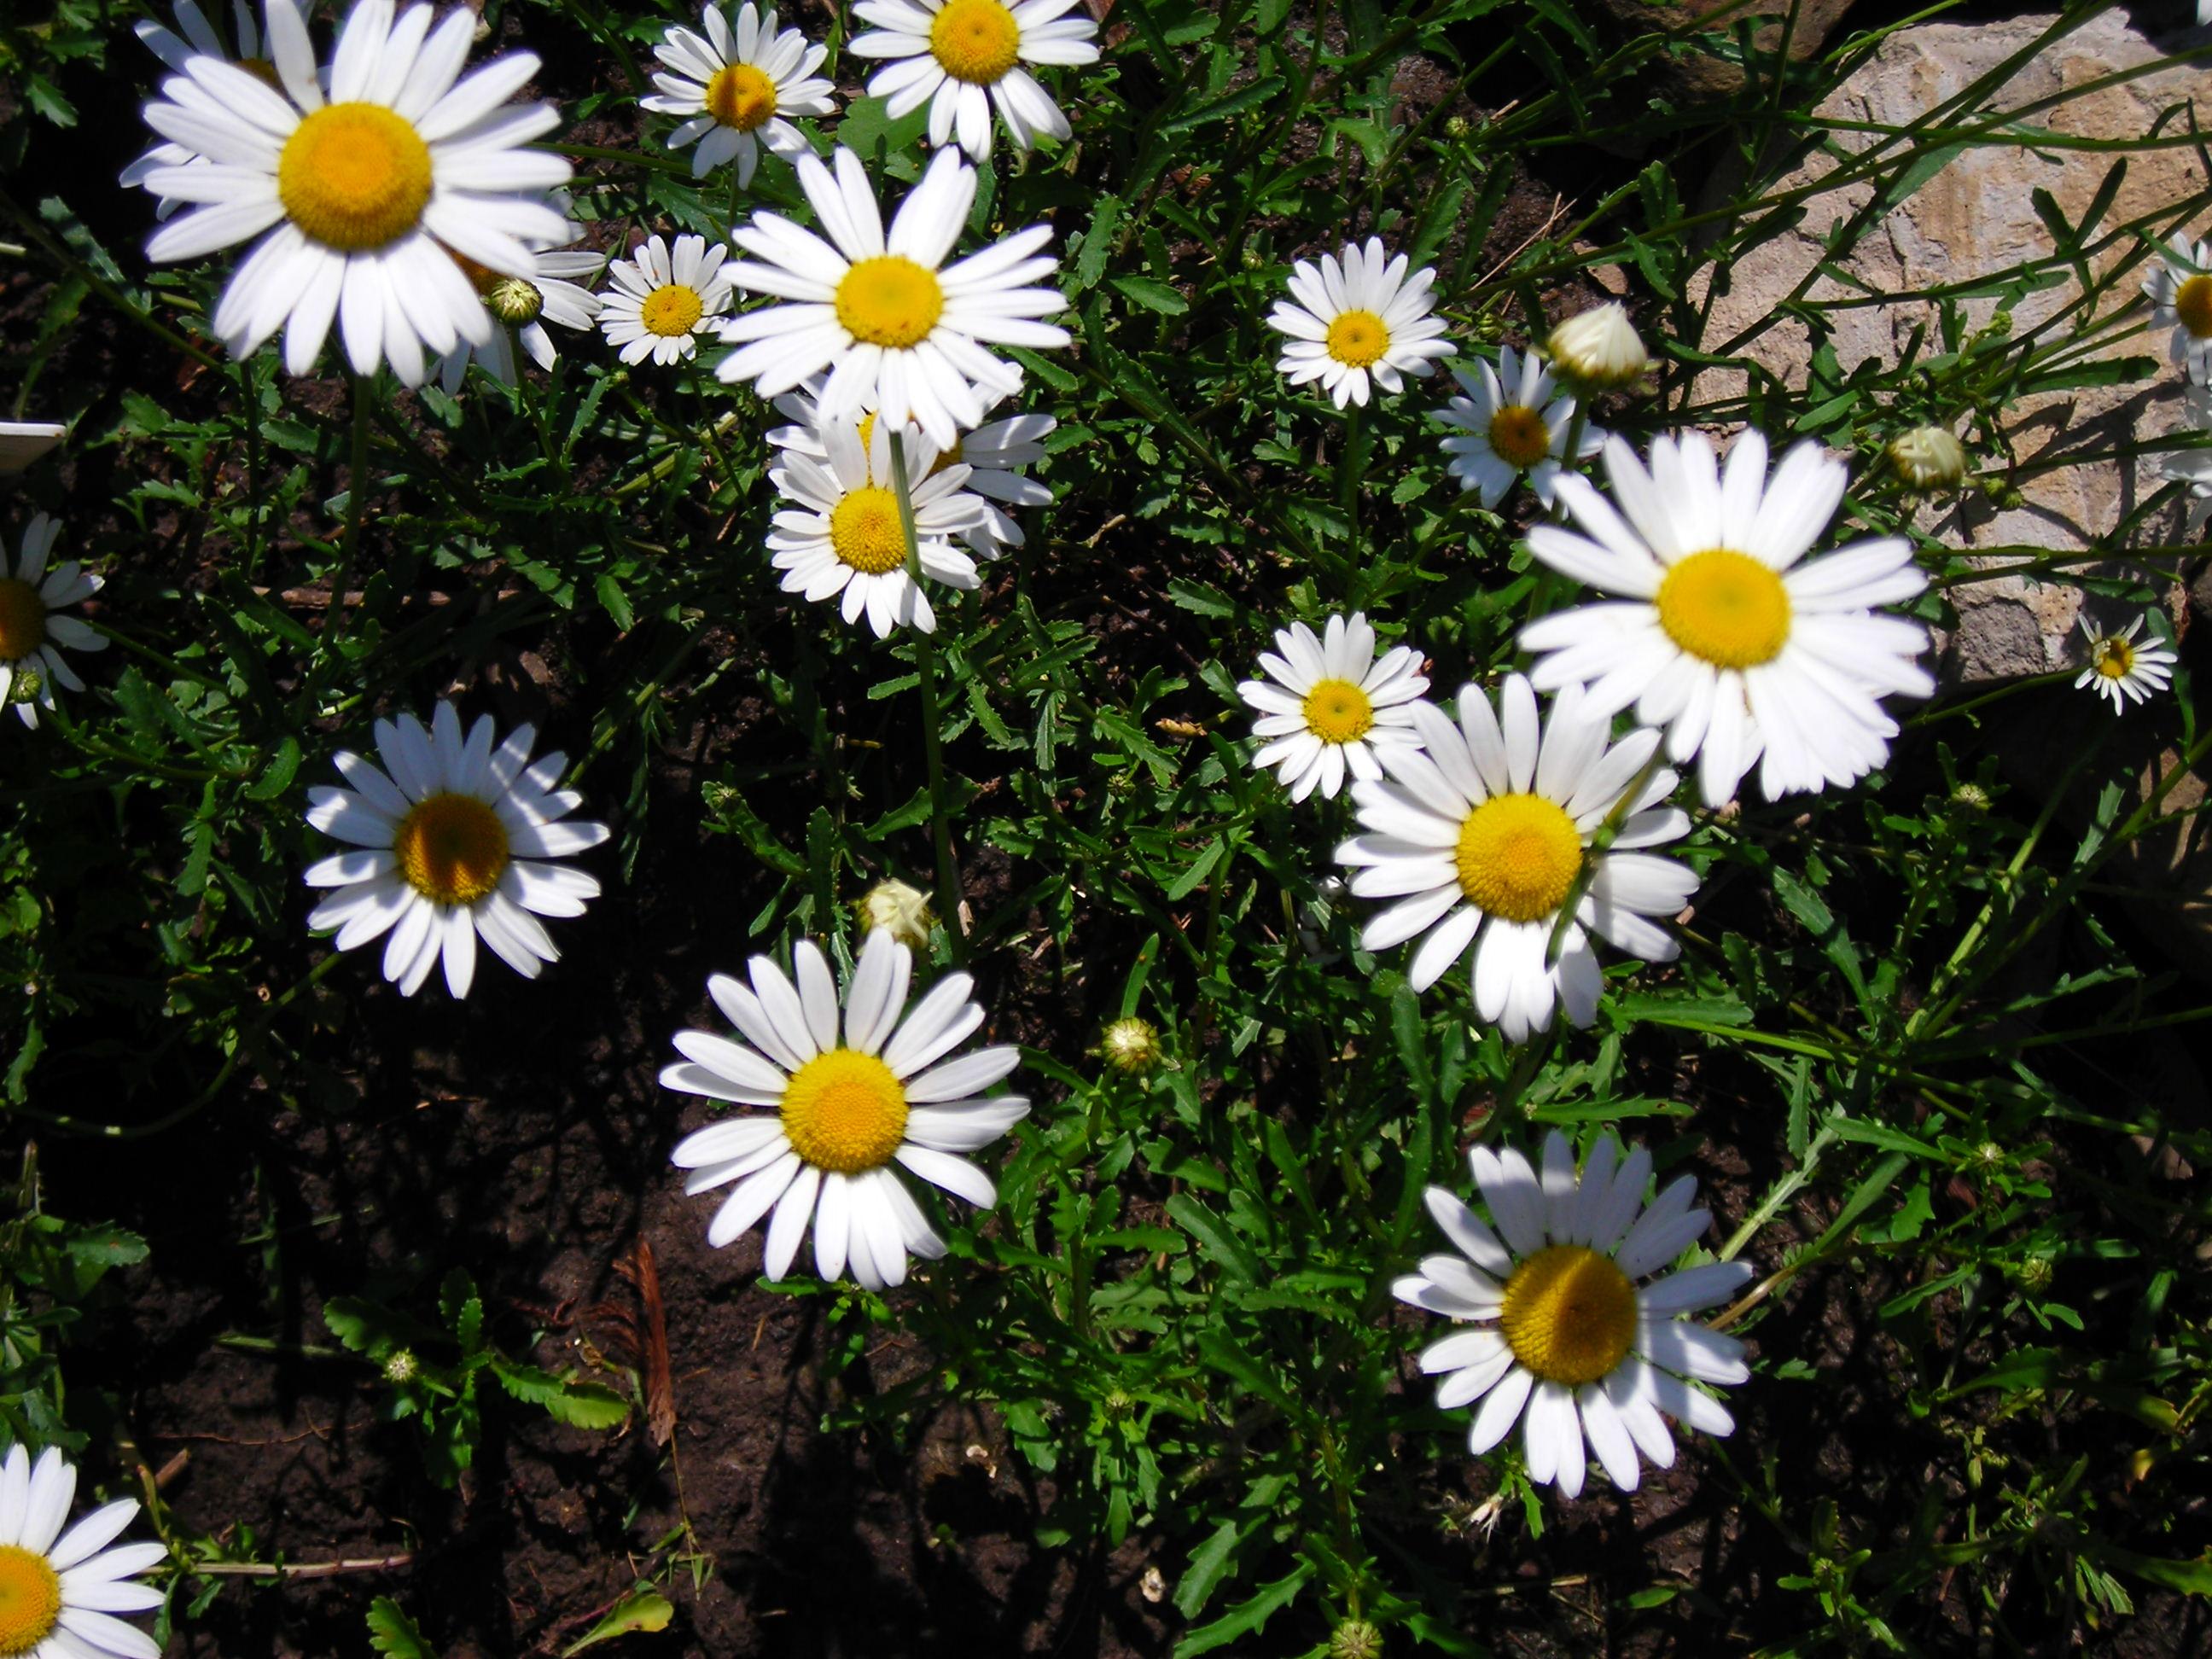 Wild daisies are sweet garden flower for Western New York - Buffalo ...